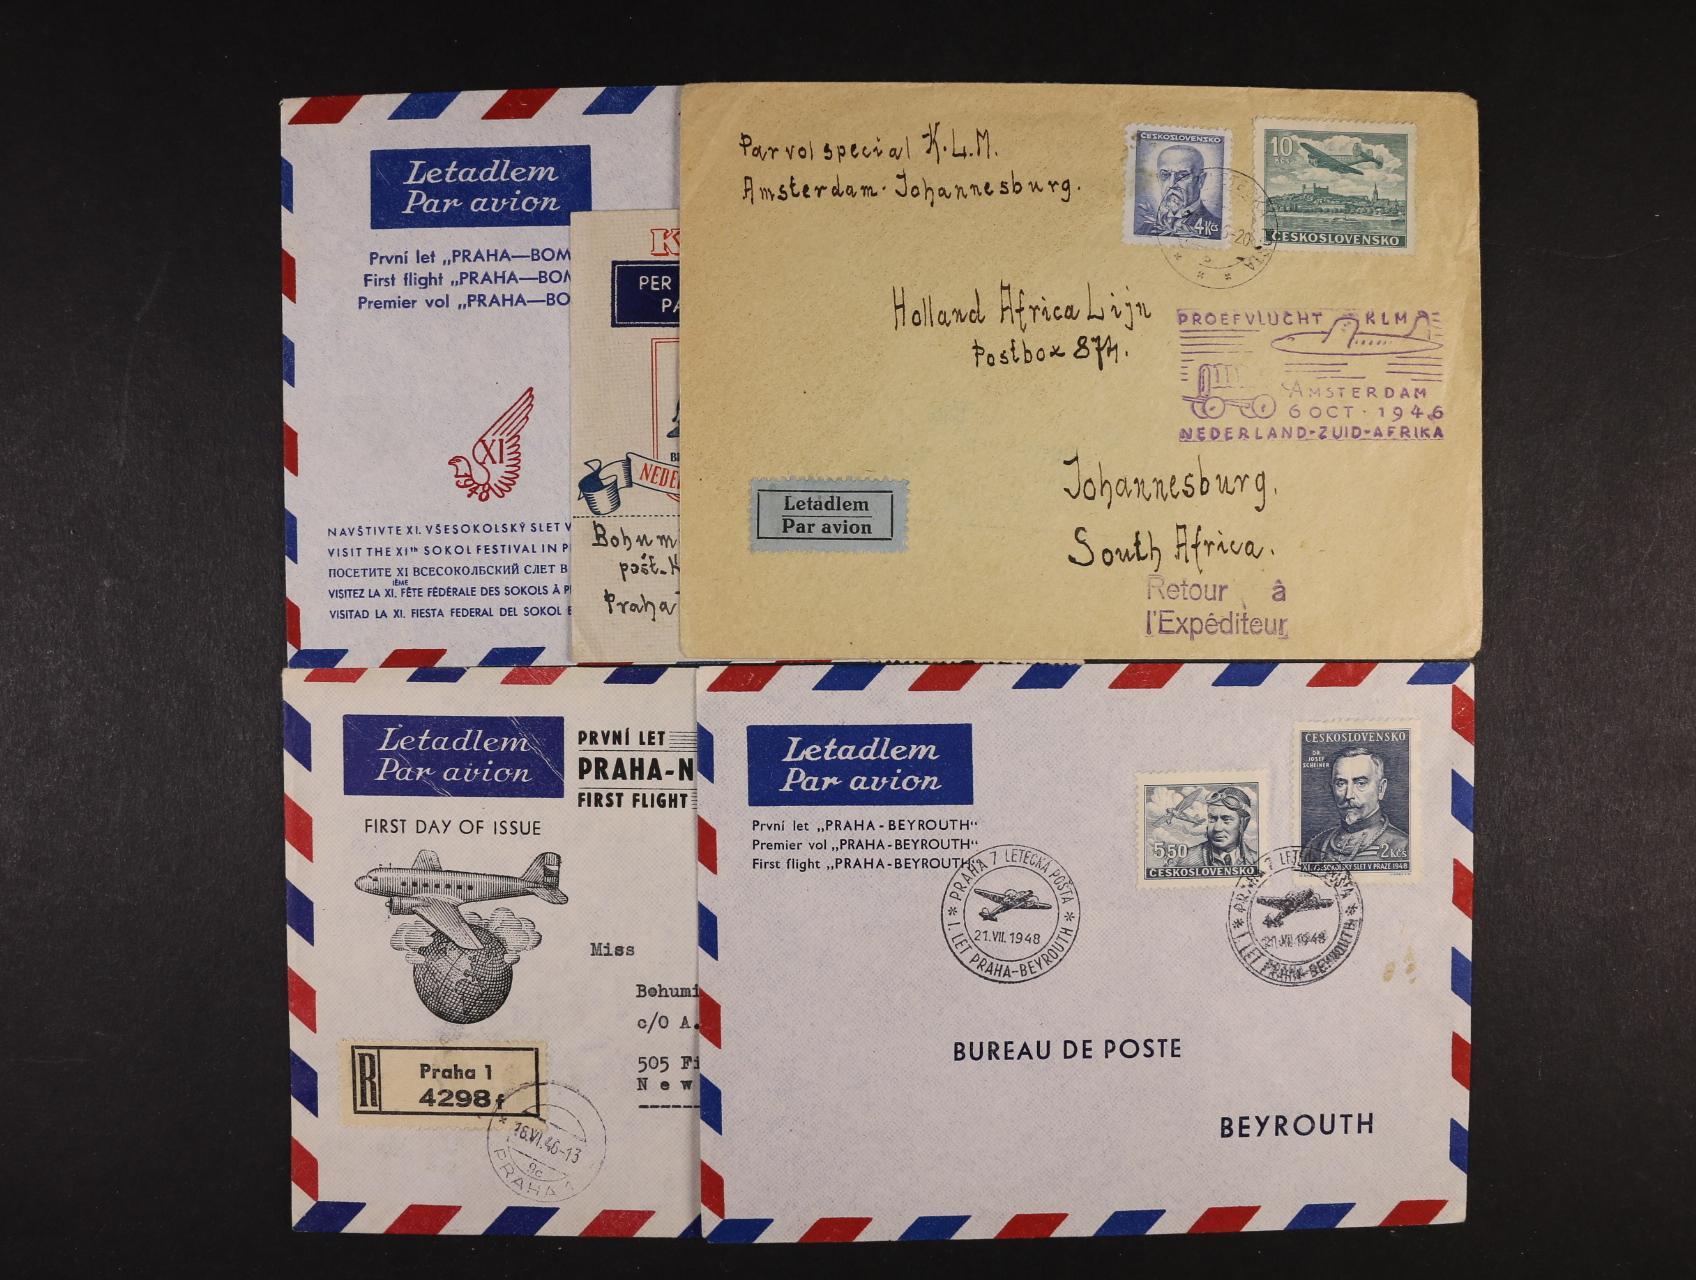 sestava 5 ks dopisů prvních letů, 2x Praha - Jižní Afrika (KLM), Praha - Bombay, Praha - Beyrout, Praha - New York